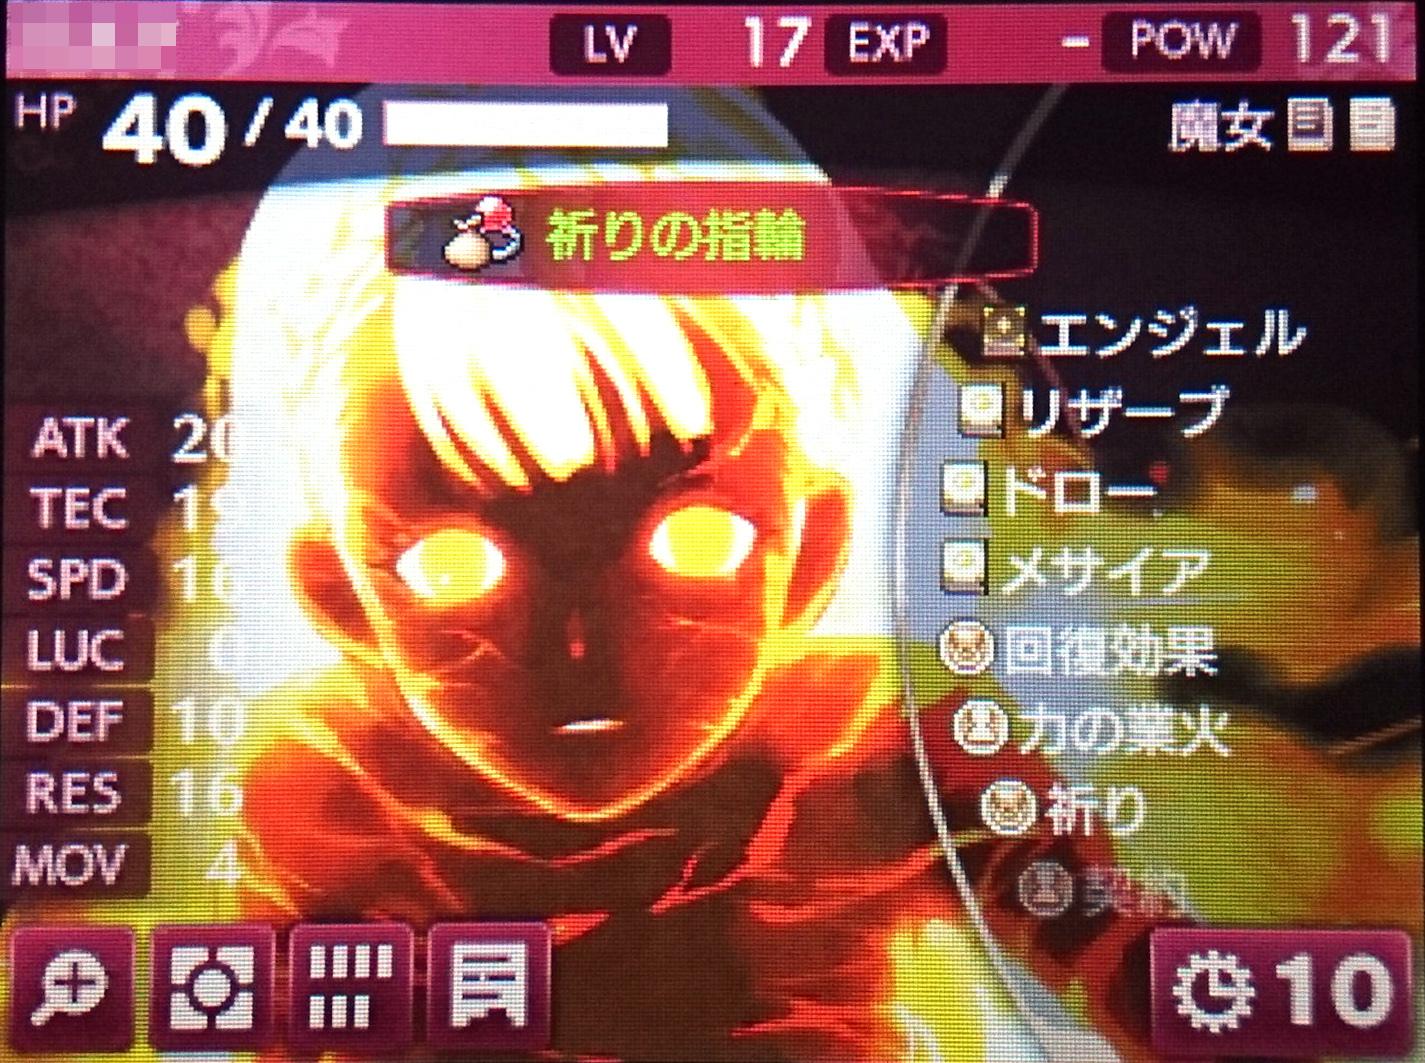 17-05-20-21-53-50-043_photo.jpg